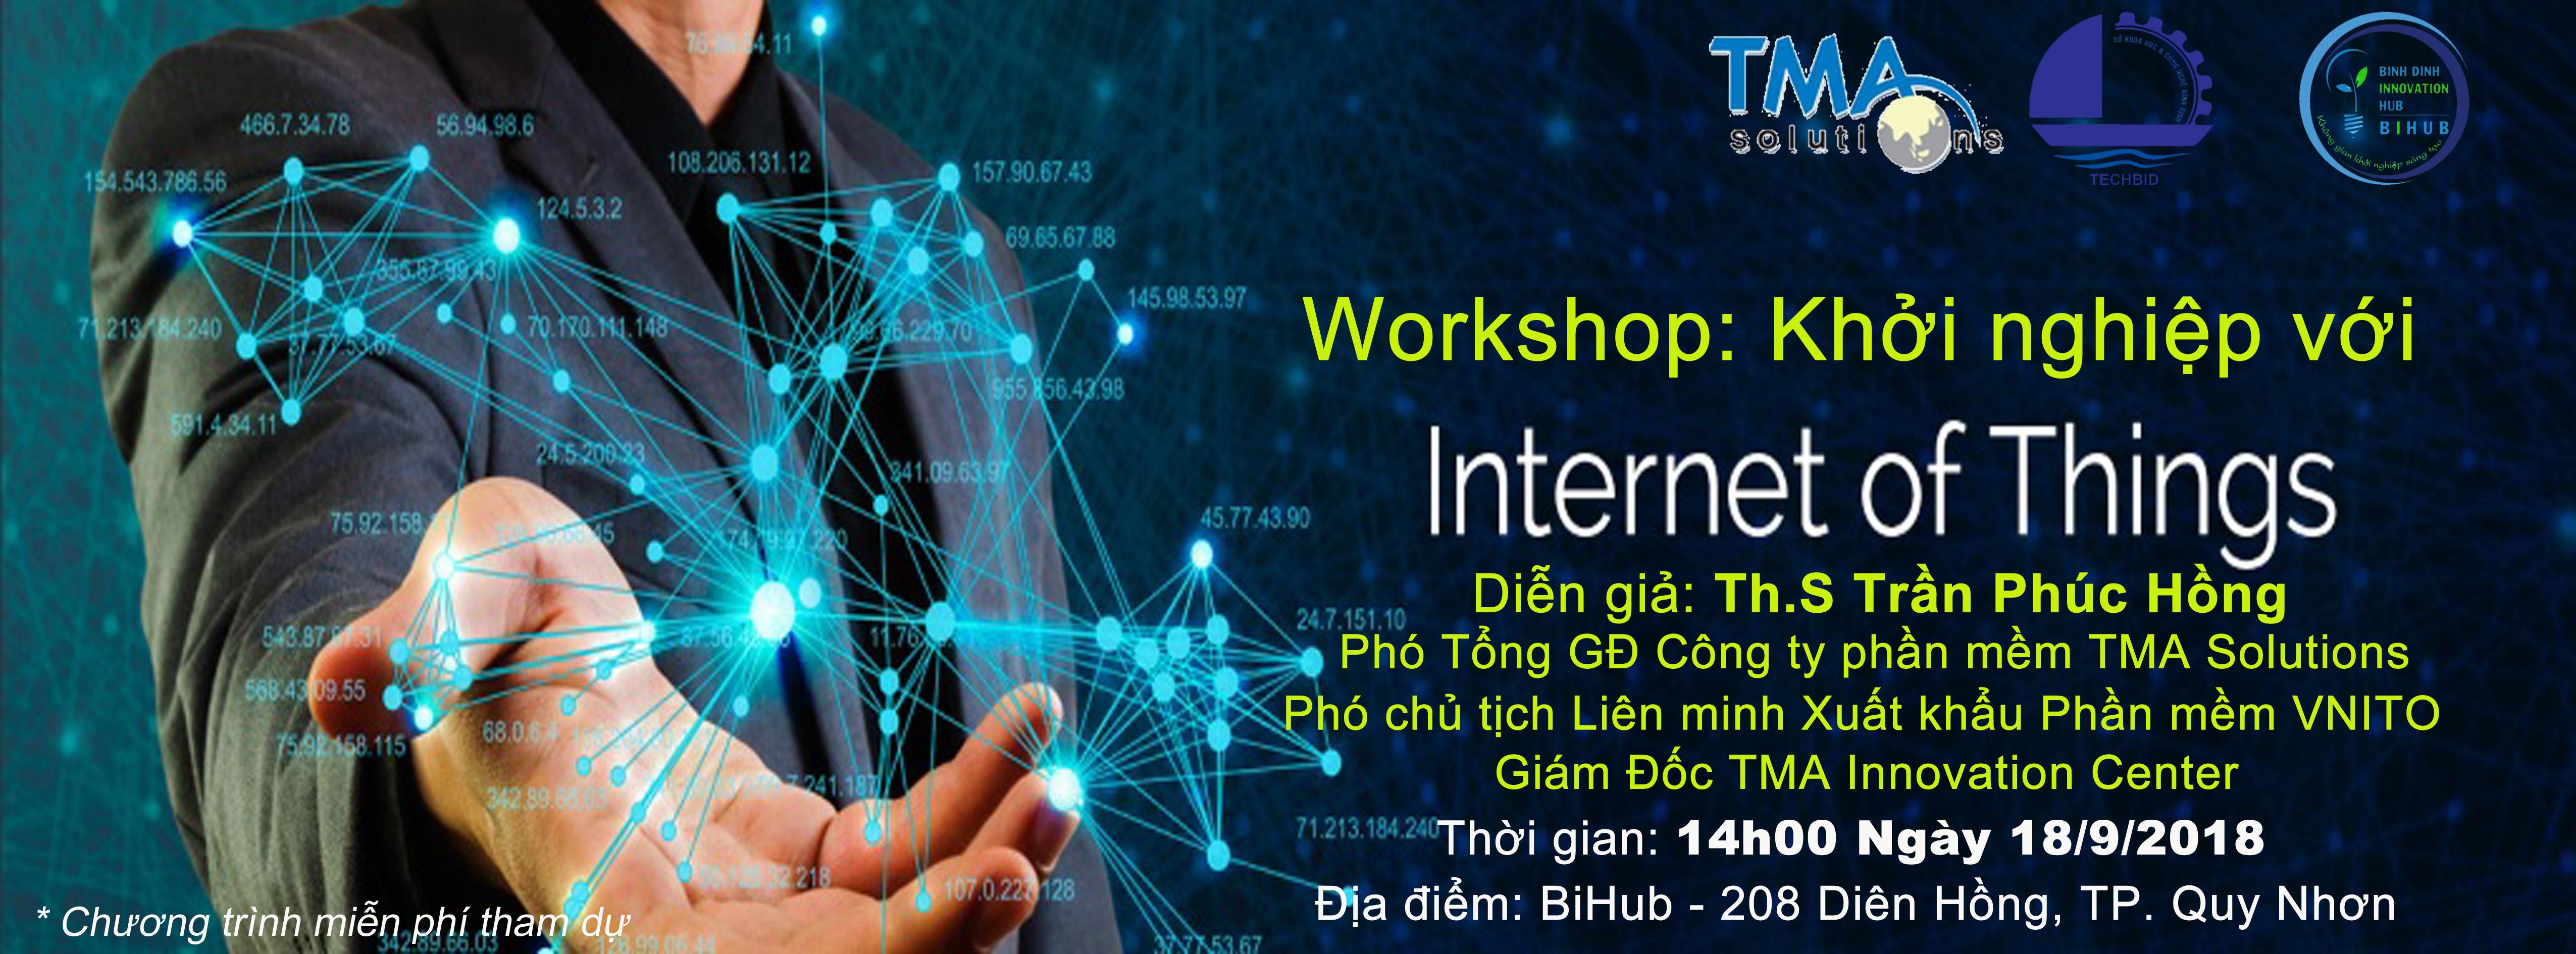 "WORKSHOP ""KHỞI NGHIỆP VỚI INTERNET OF THING (IOT)"""